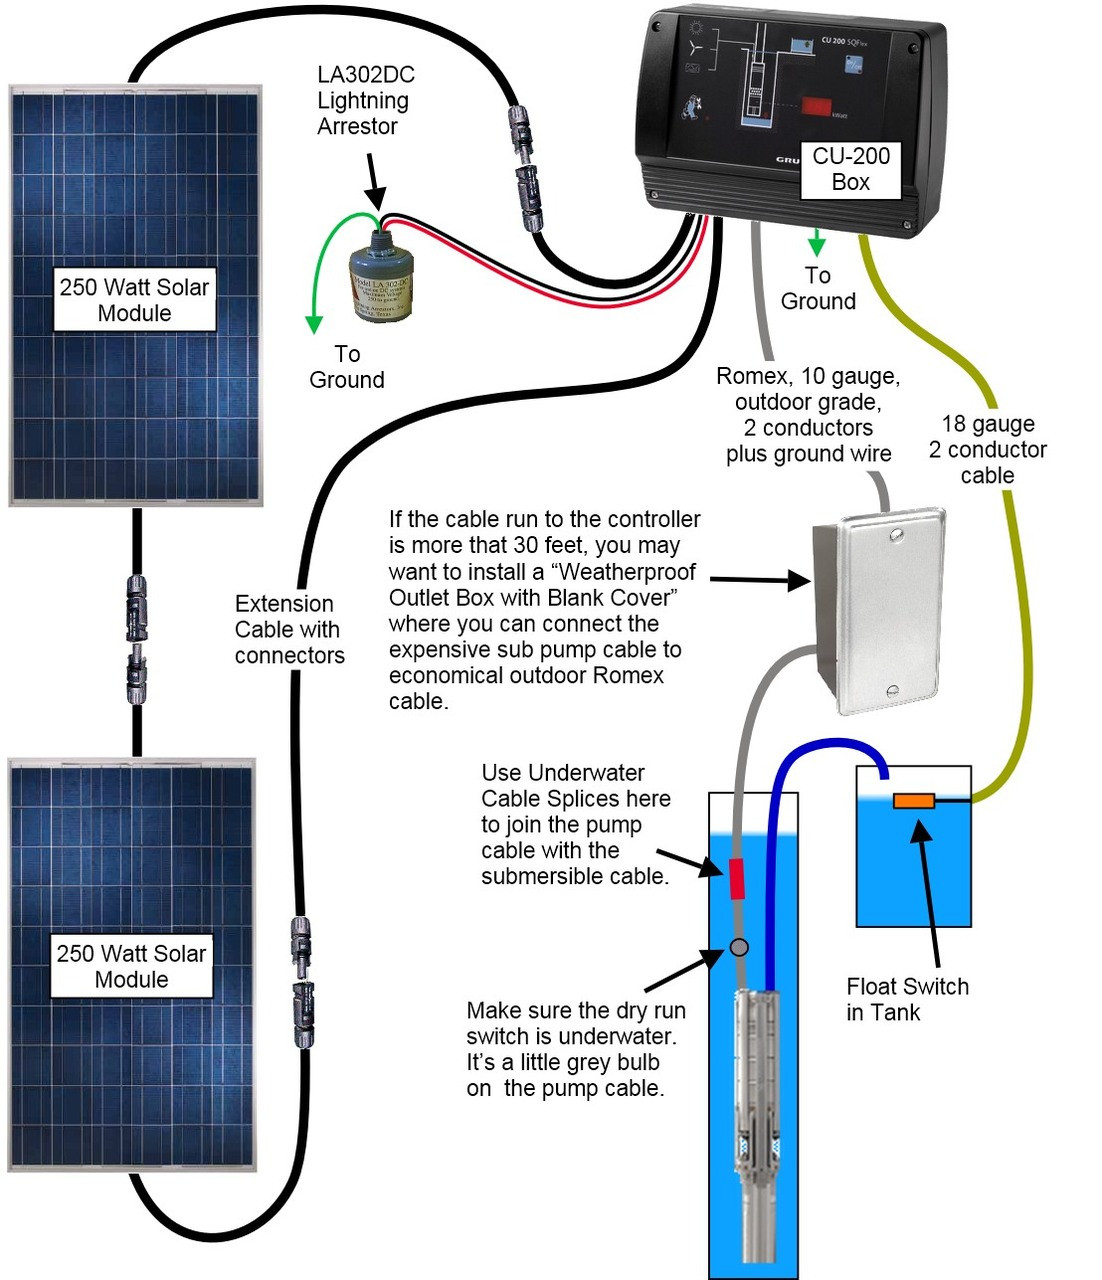 Grundfos Wiring Diagram Schematics Ao Smith Solar Panel Another Blog About Sqflex 25sqf